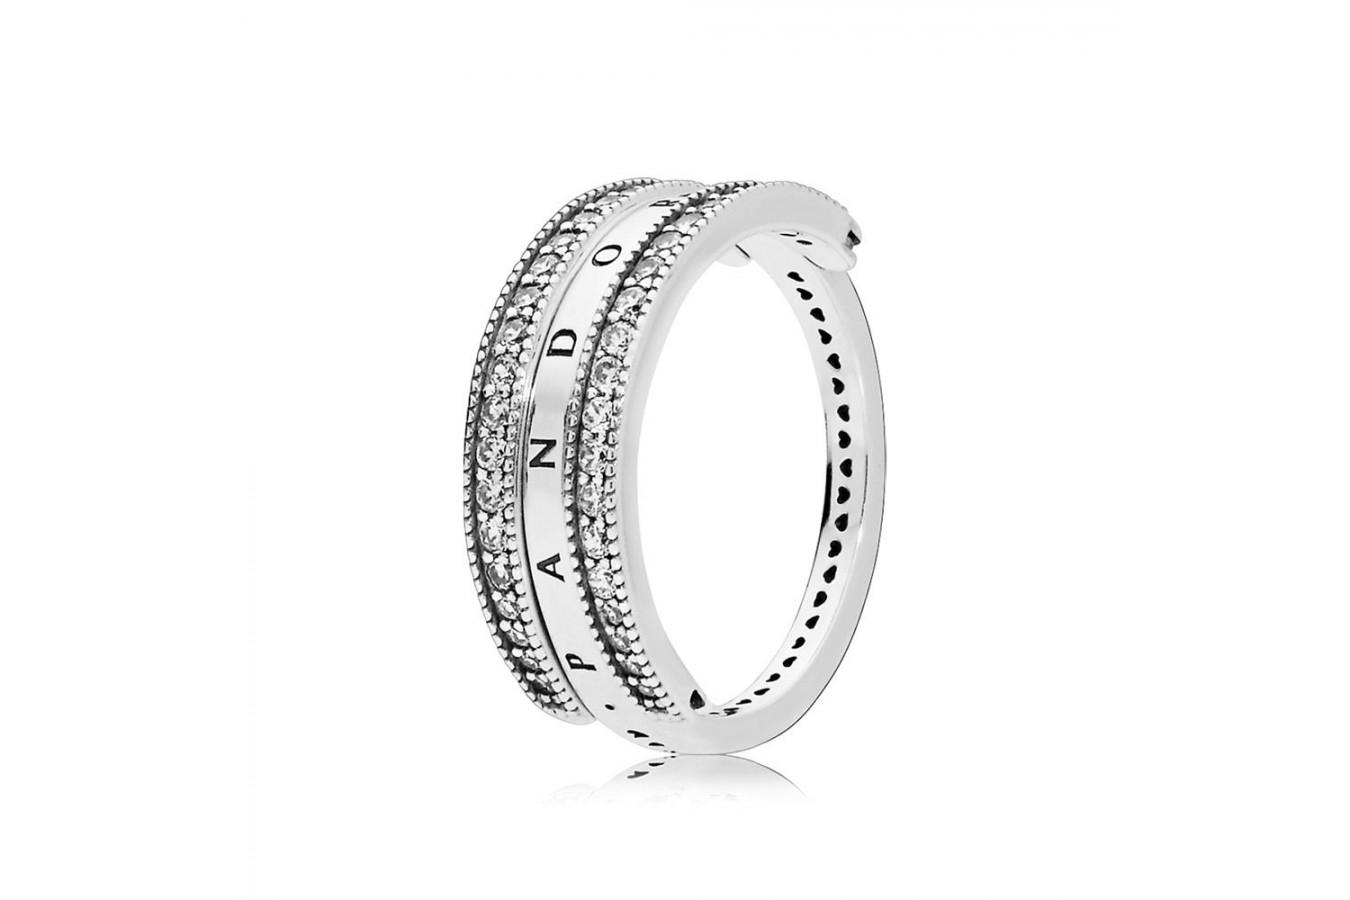 Kaufen Billig Pandora Neueste Kollektion Ringe Flipping Hearts Of Throughout Recent Pandora Logo Pavé Rings (Gallery 19 of 25)